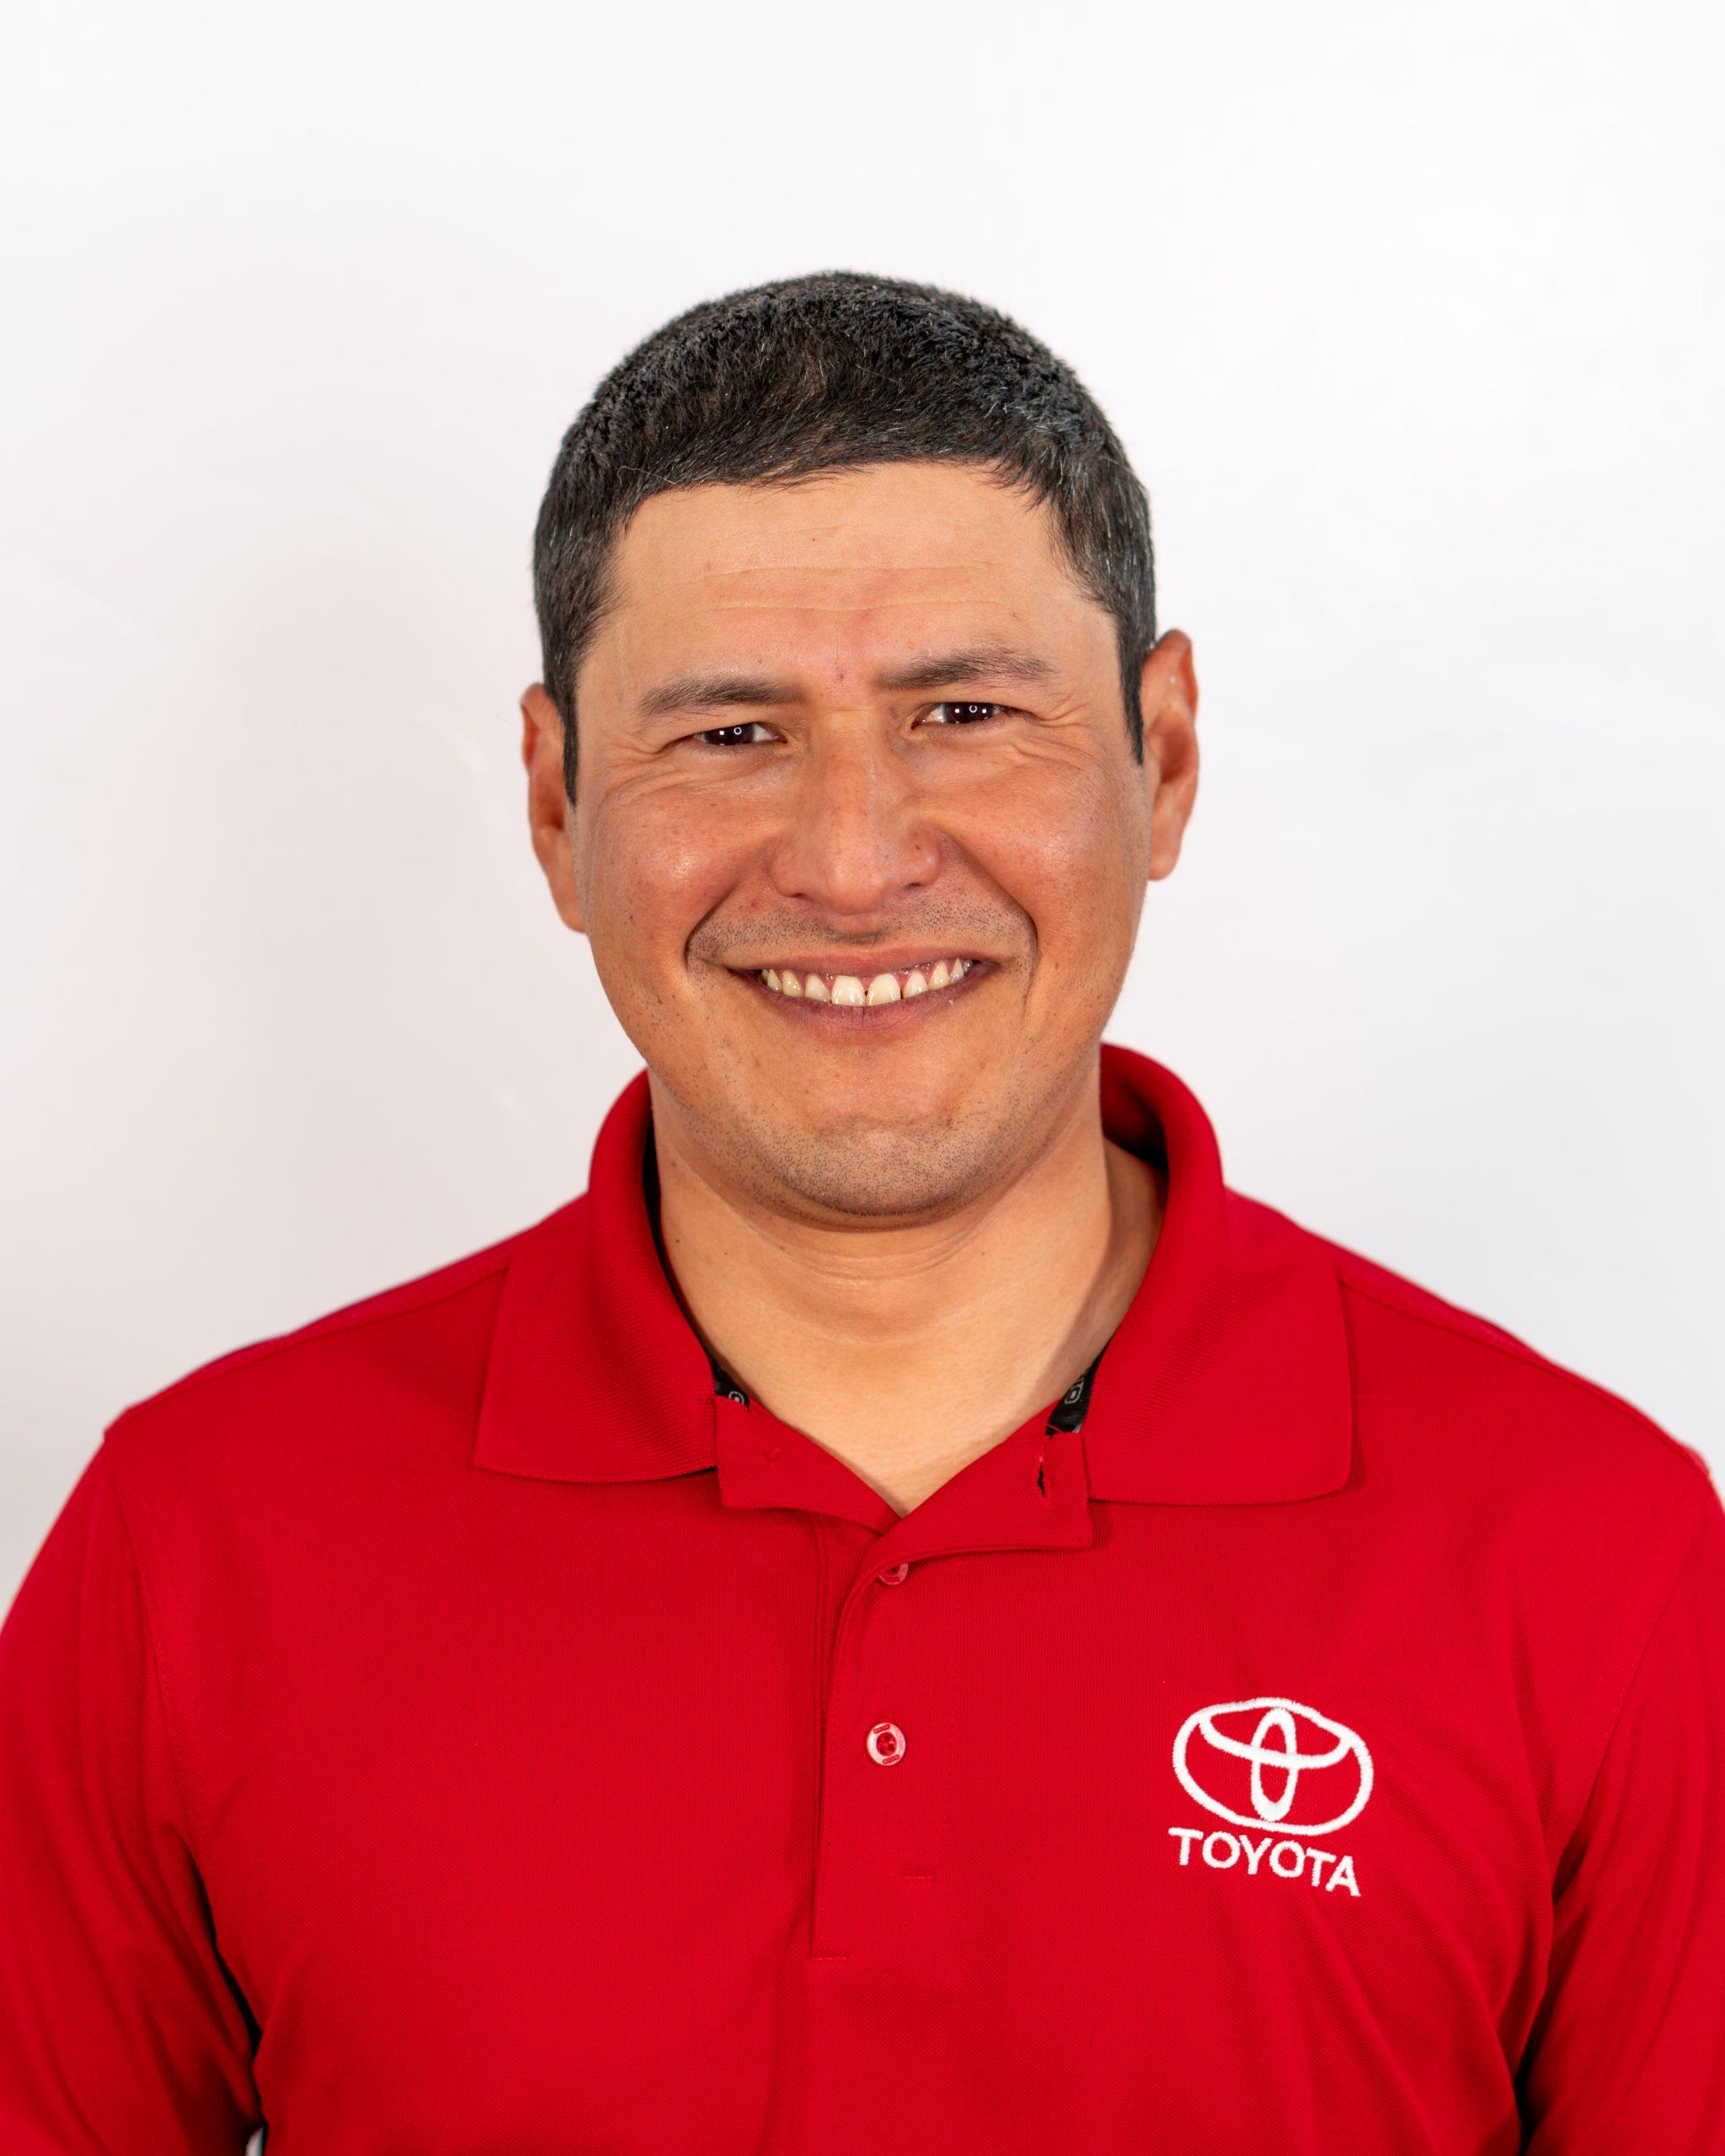 Marco Palacios